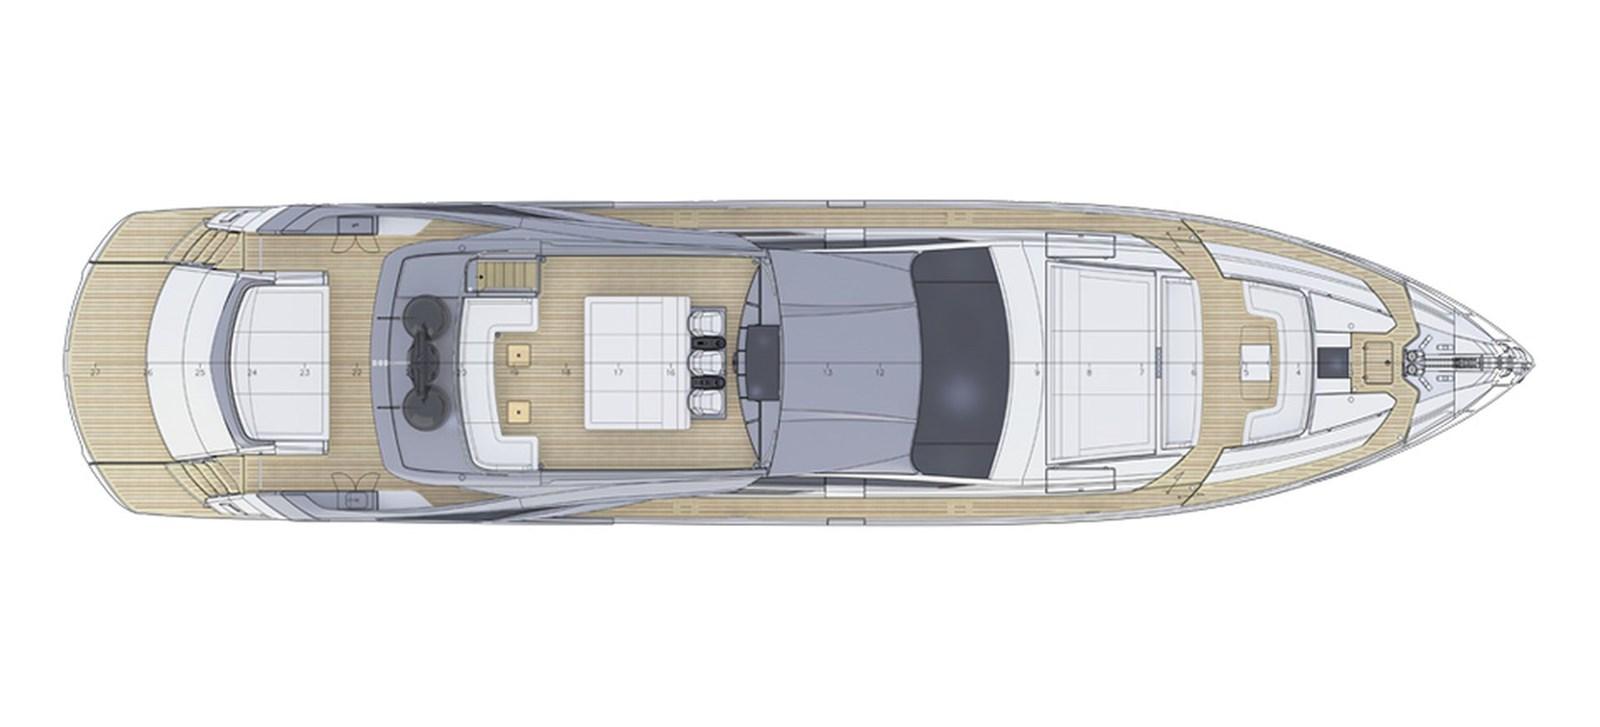 Pershing_9xNew_Sun Deck_26639 2018 PERSHING  Motor Yacht 2828982